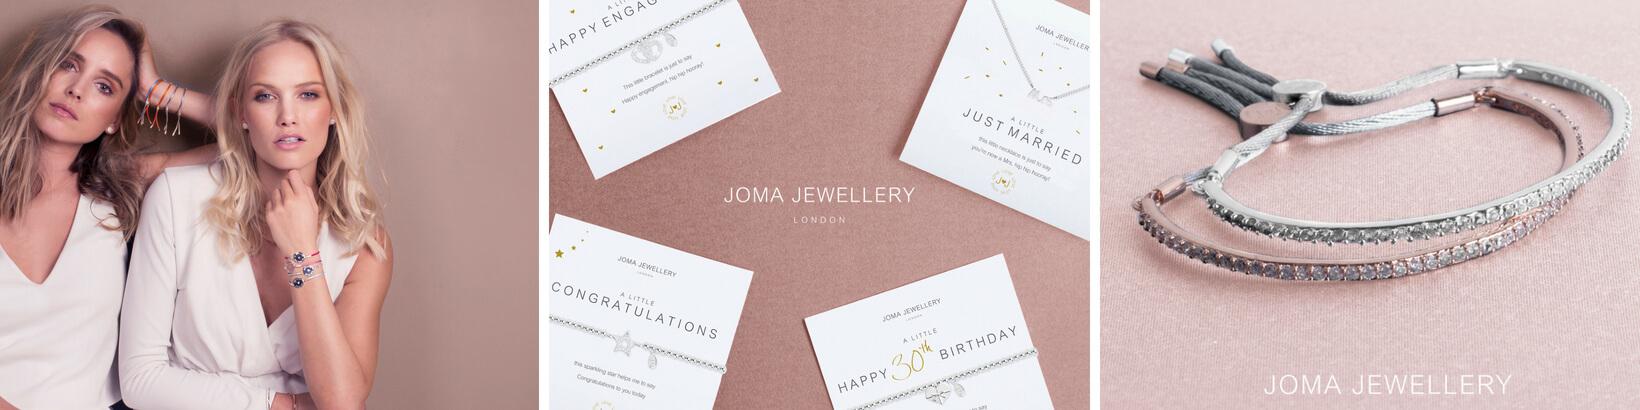 kategoriebanner-accessoires-joma-jewellery